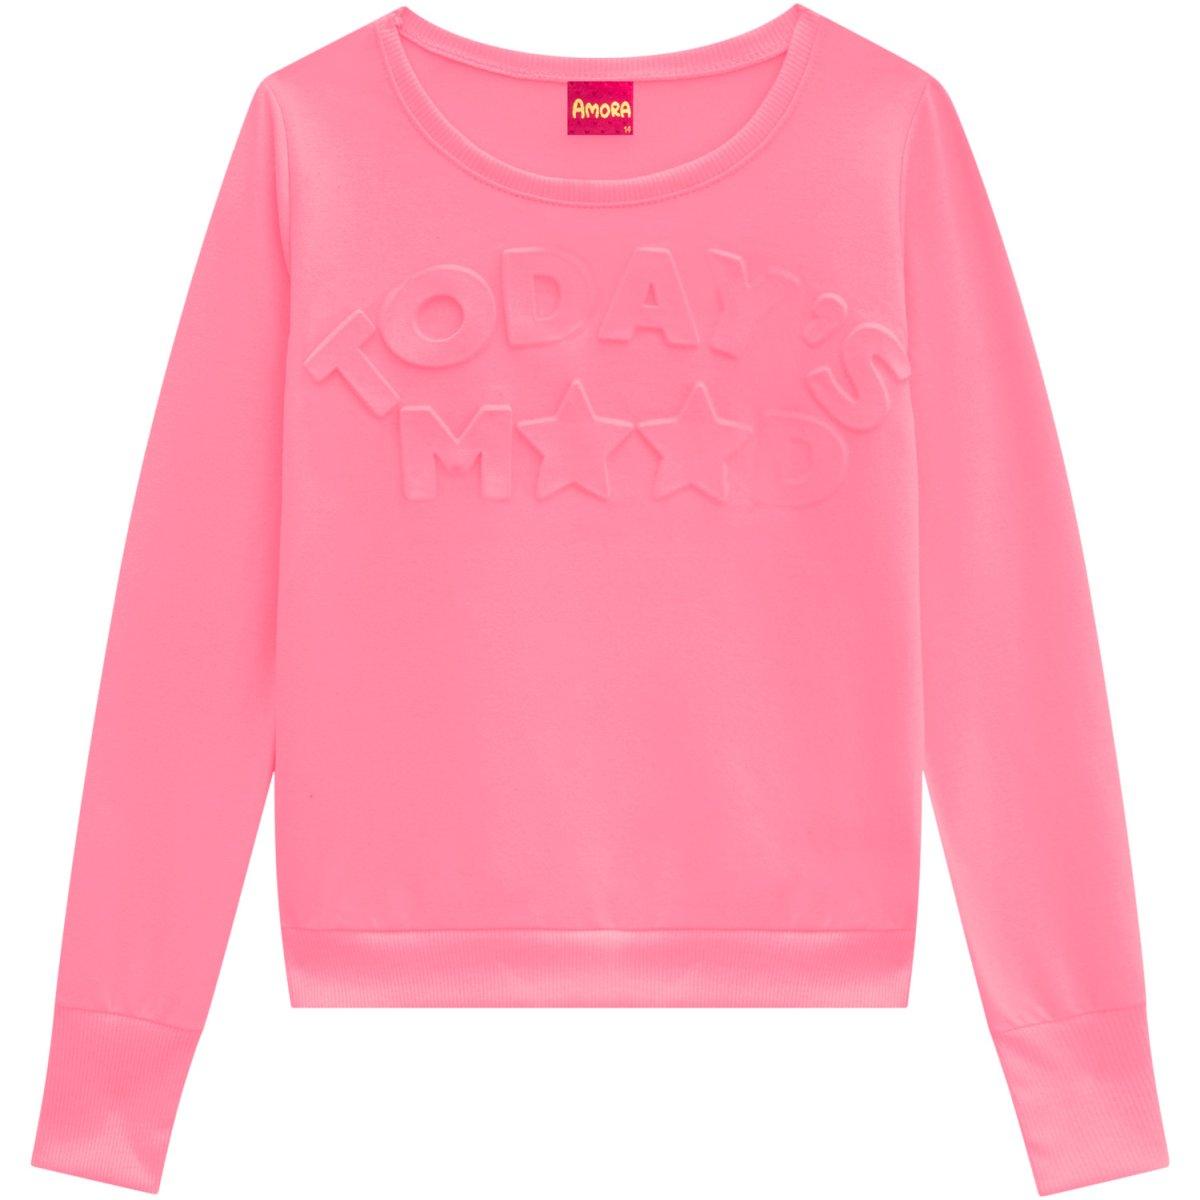 Blusa Teen Feminina Amora em Malha Sublimada Pink Neon